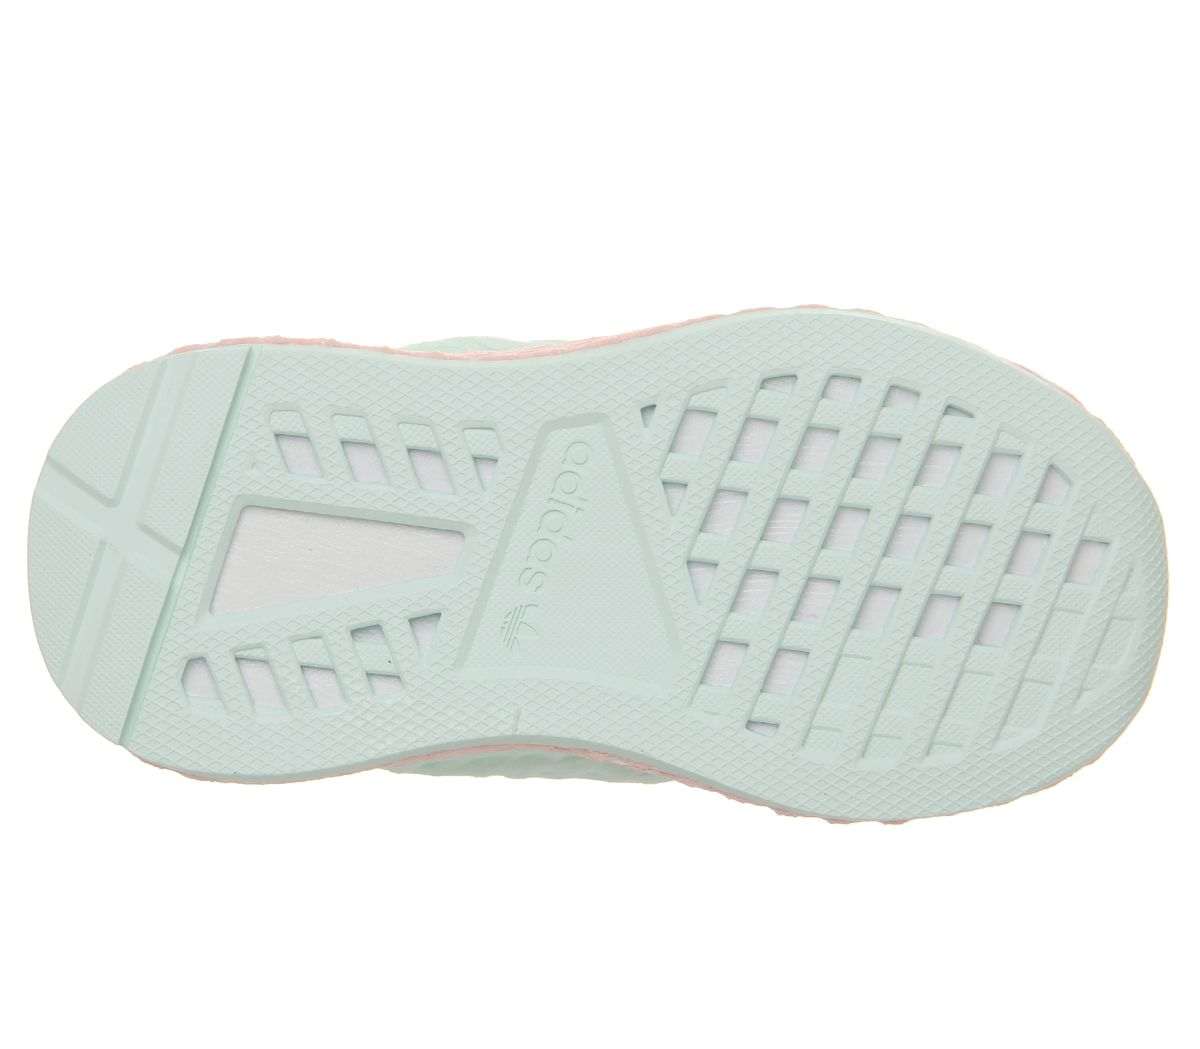 6c1af113e adidas Deerupt Infant Trainers Ice Mint Clear Orange - Kids Trainers